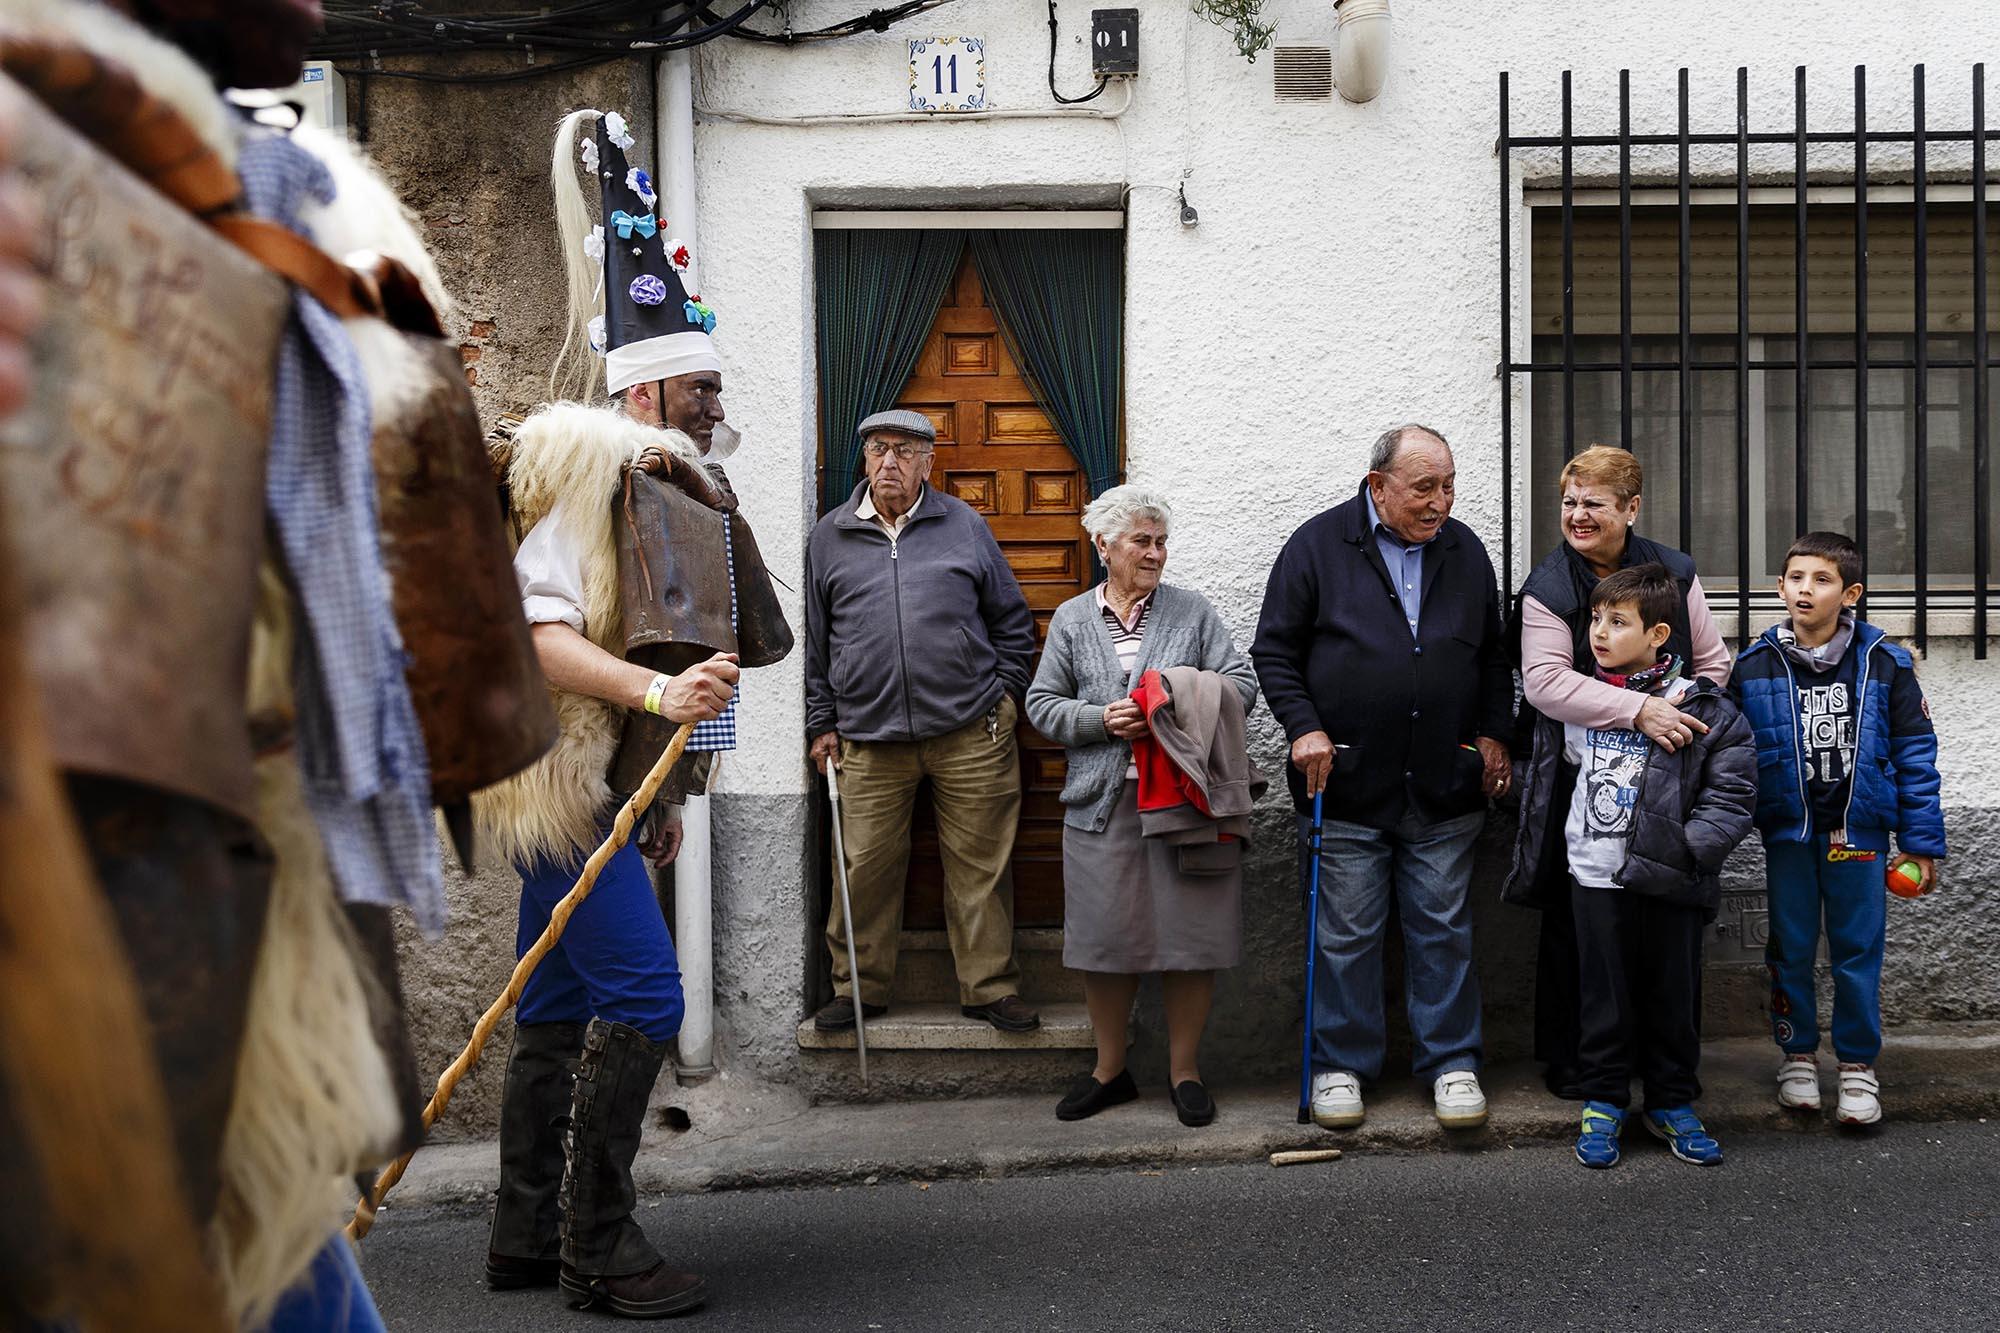 Spanish parades feature bizarre costumes, masks